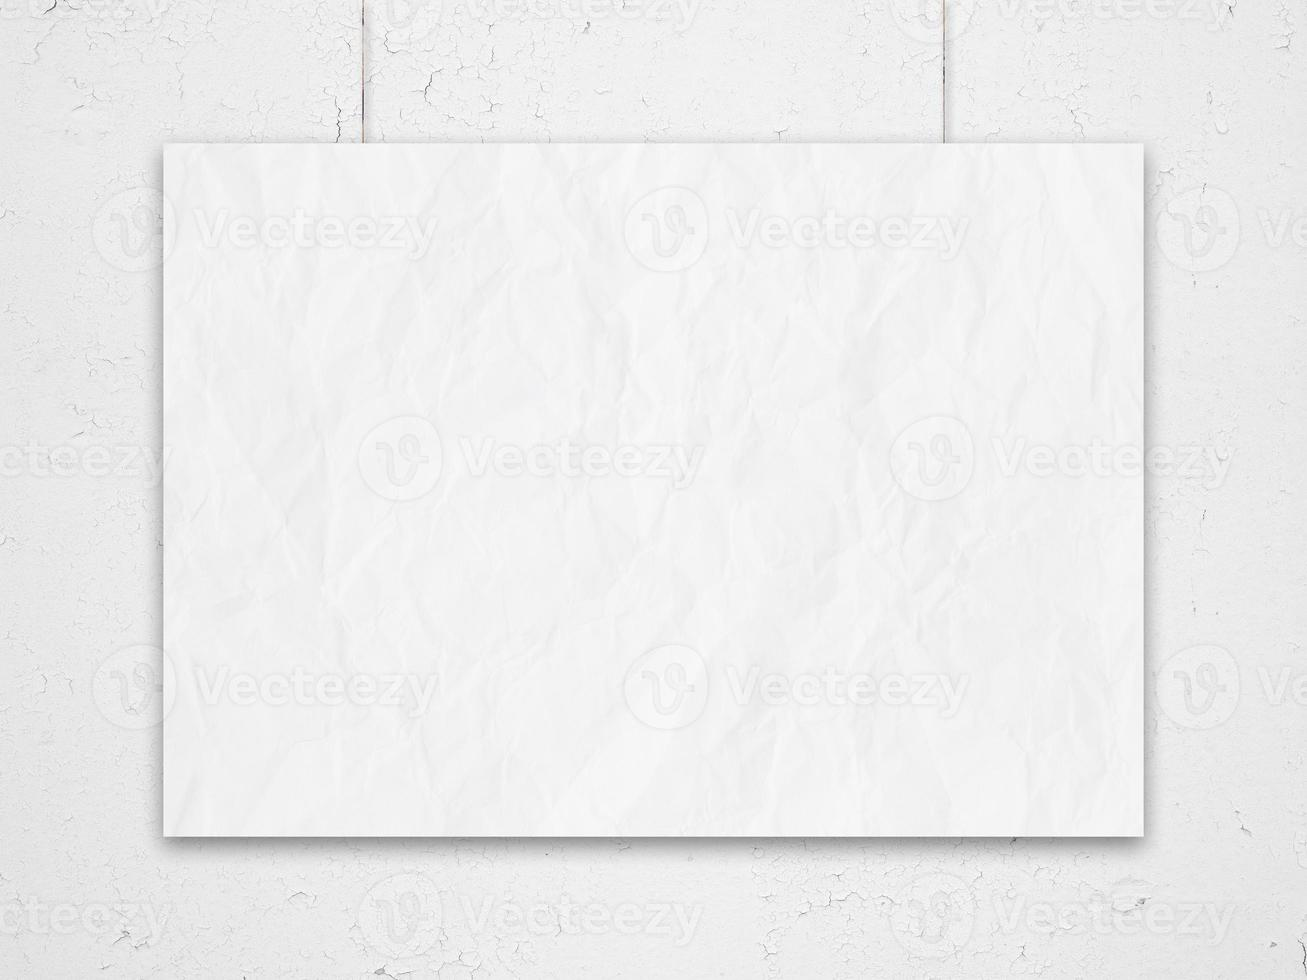 lista stropicciata bianca appesa al muro foto